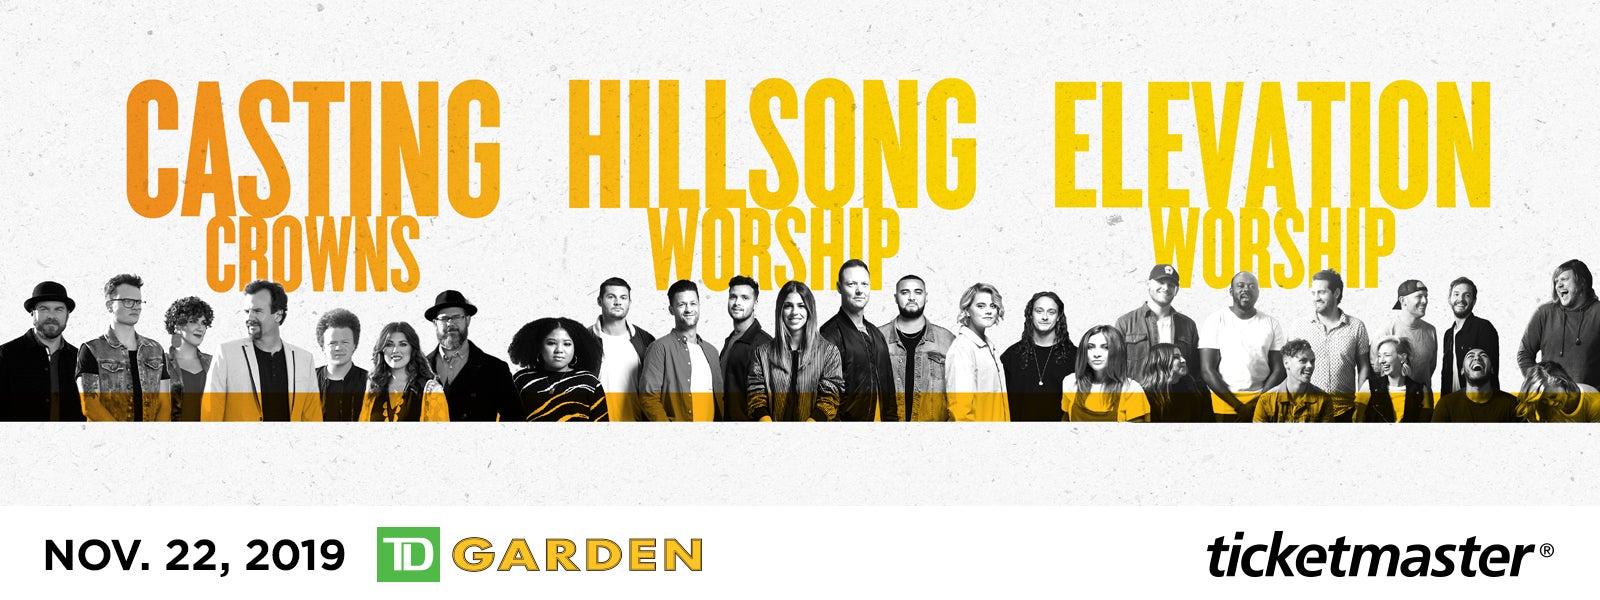 Hillsong Worship, Casting Crowns & Elevation Worship